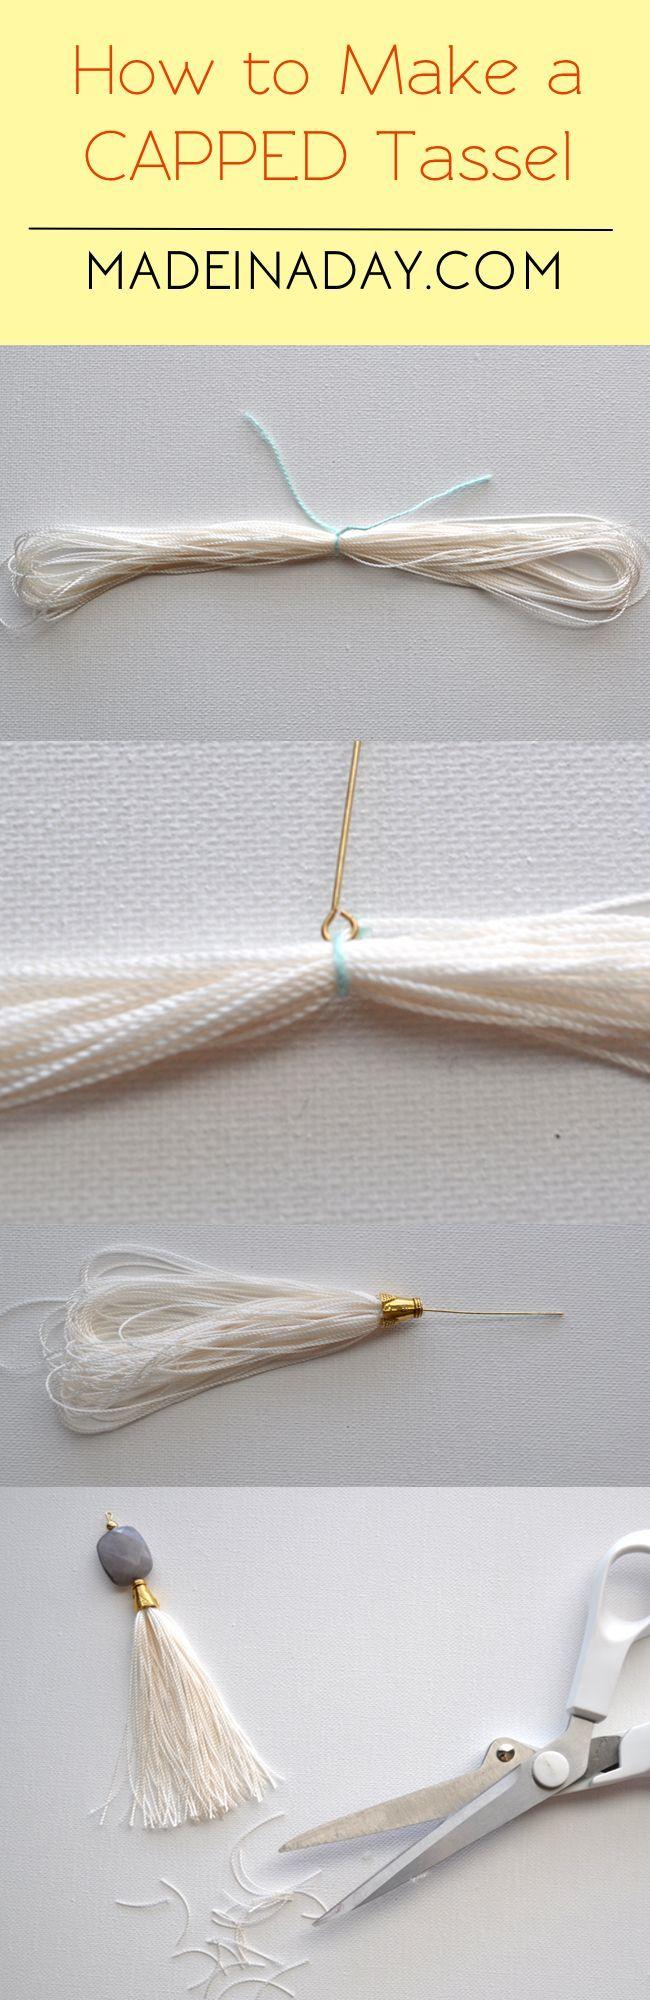 DIY Capped Tassels